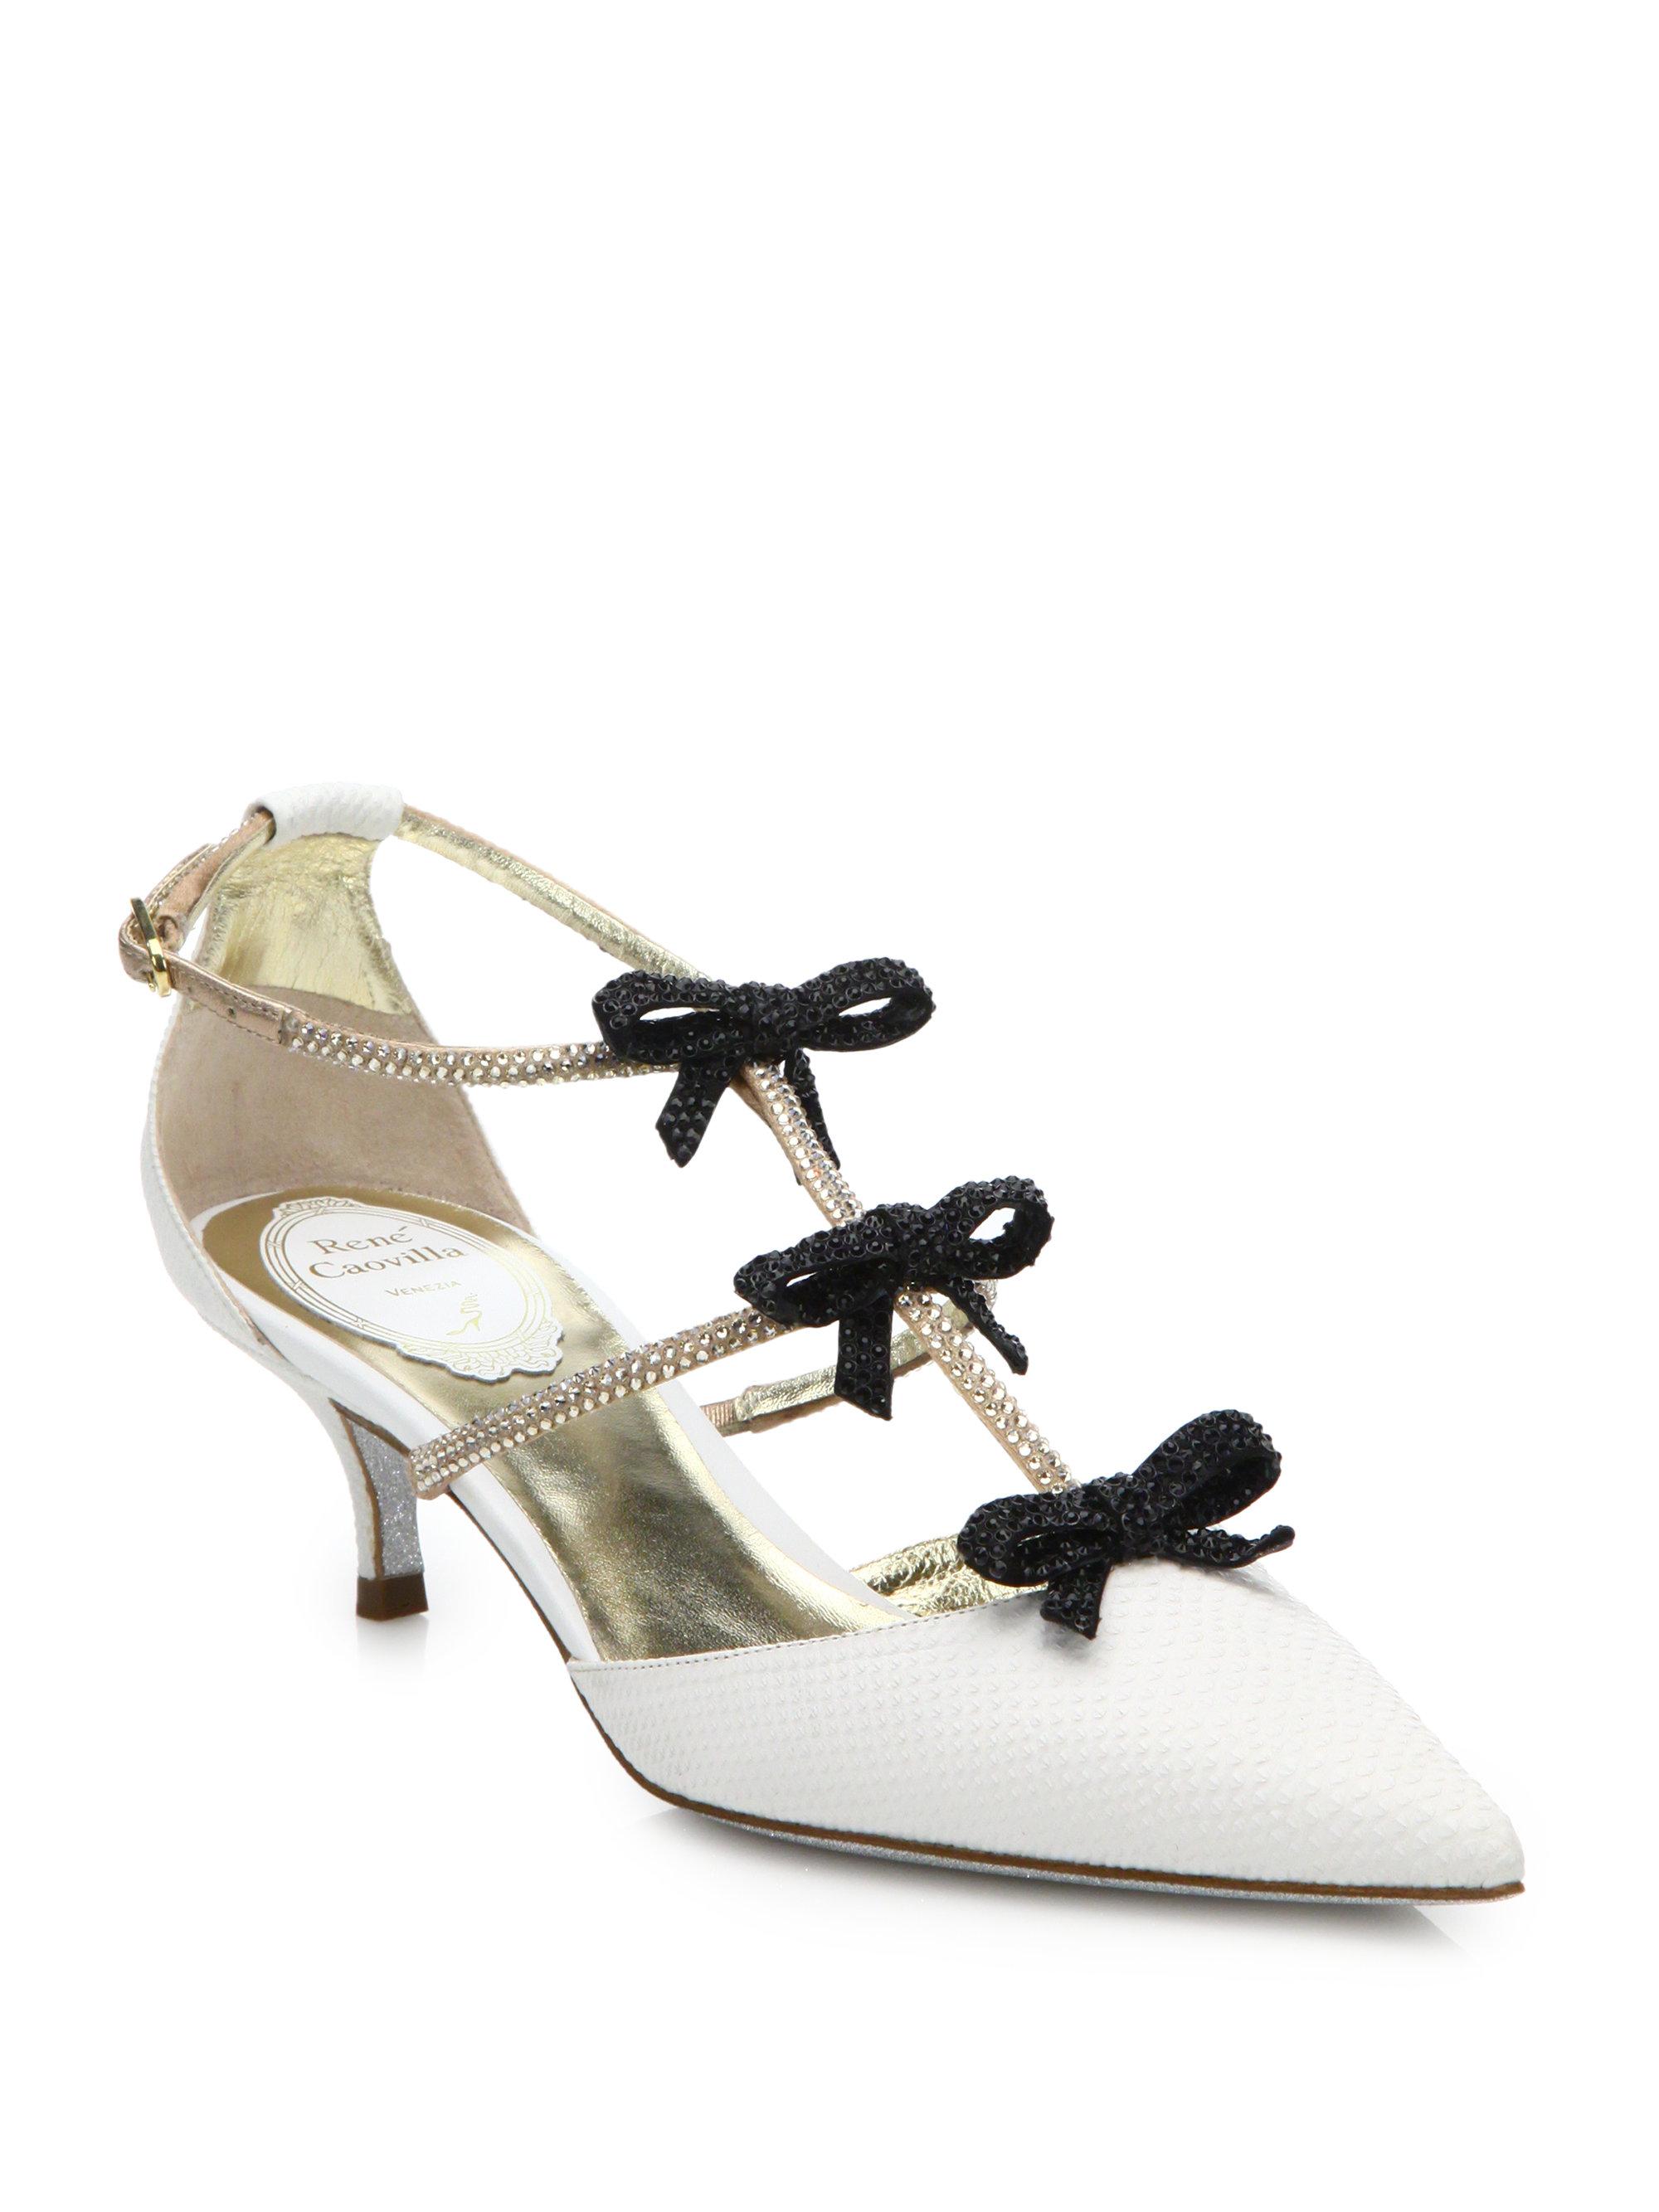 RENé CAOVILLA Leather Heels 7BVXoT